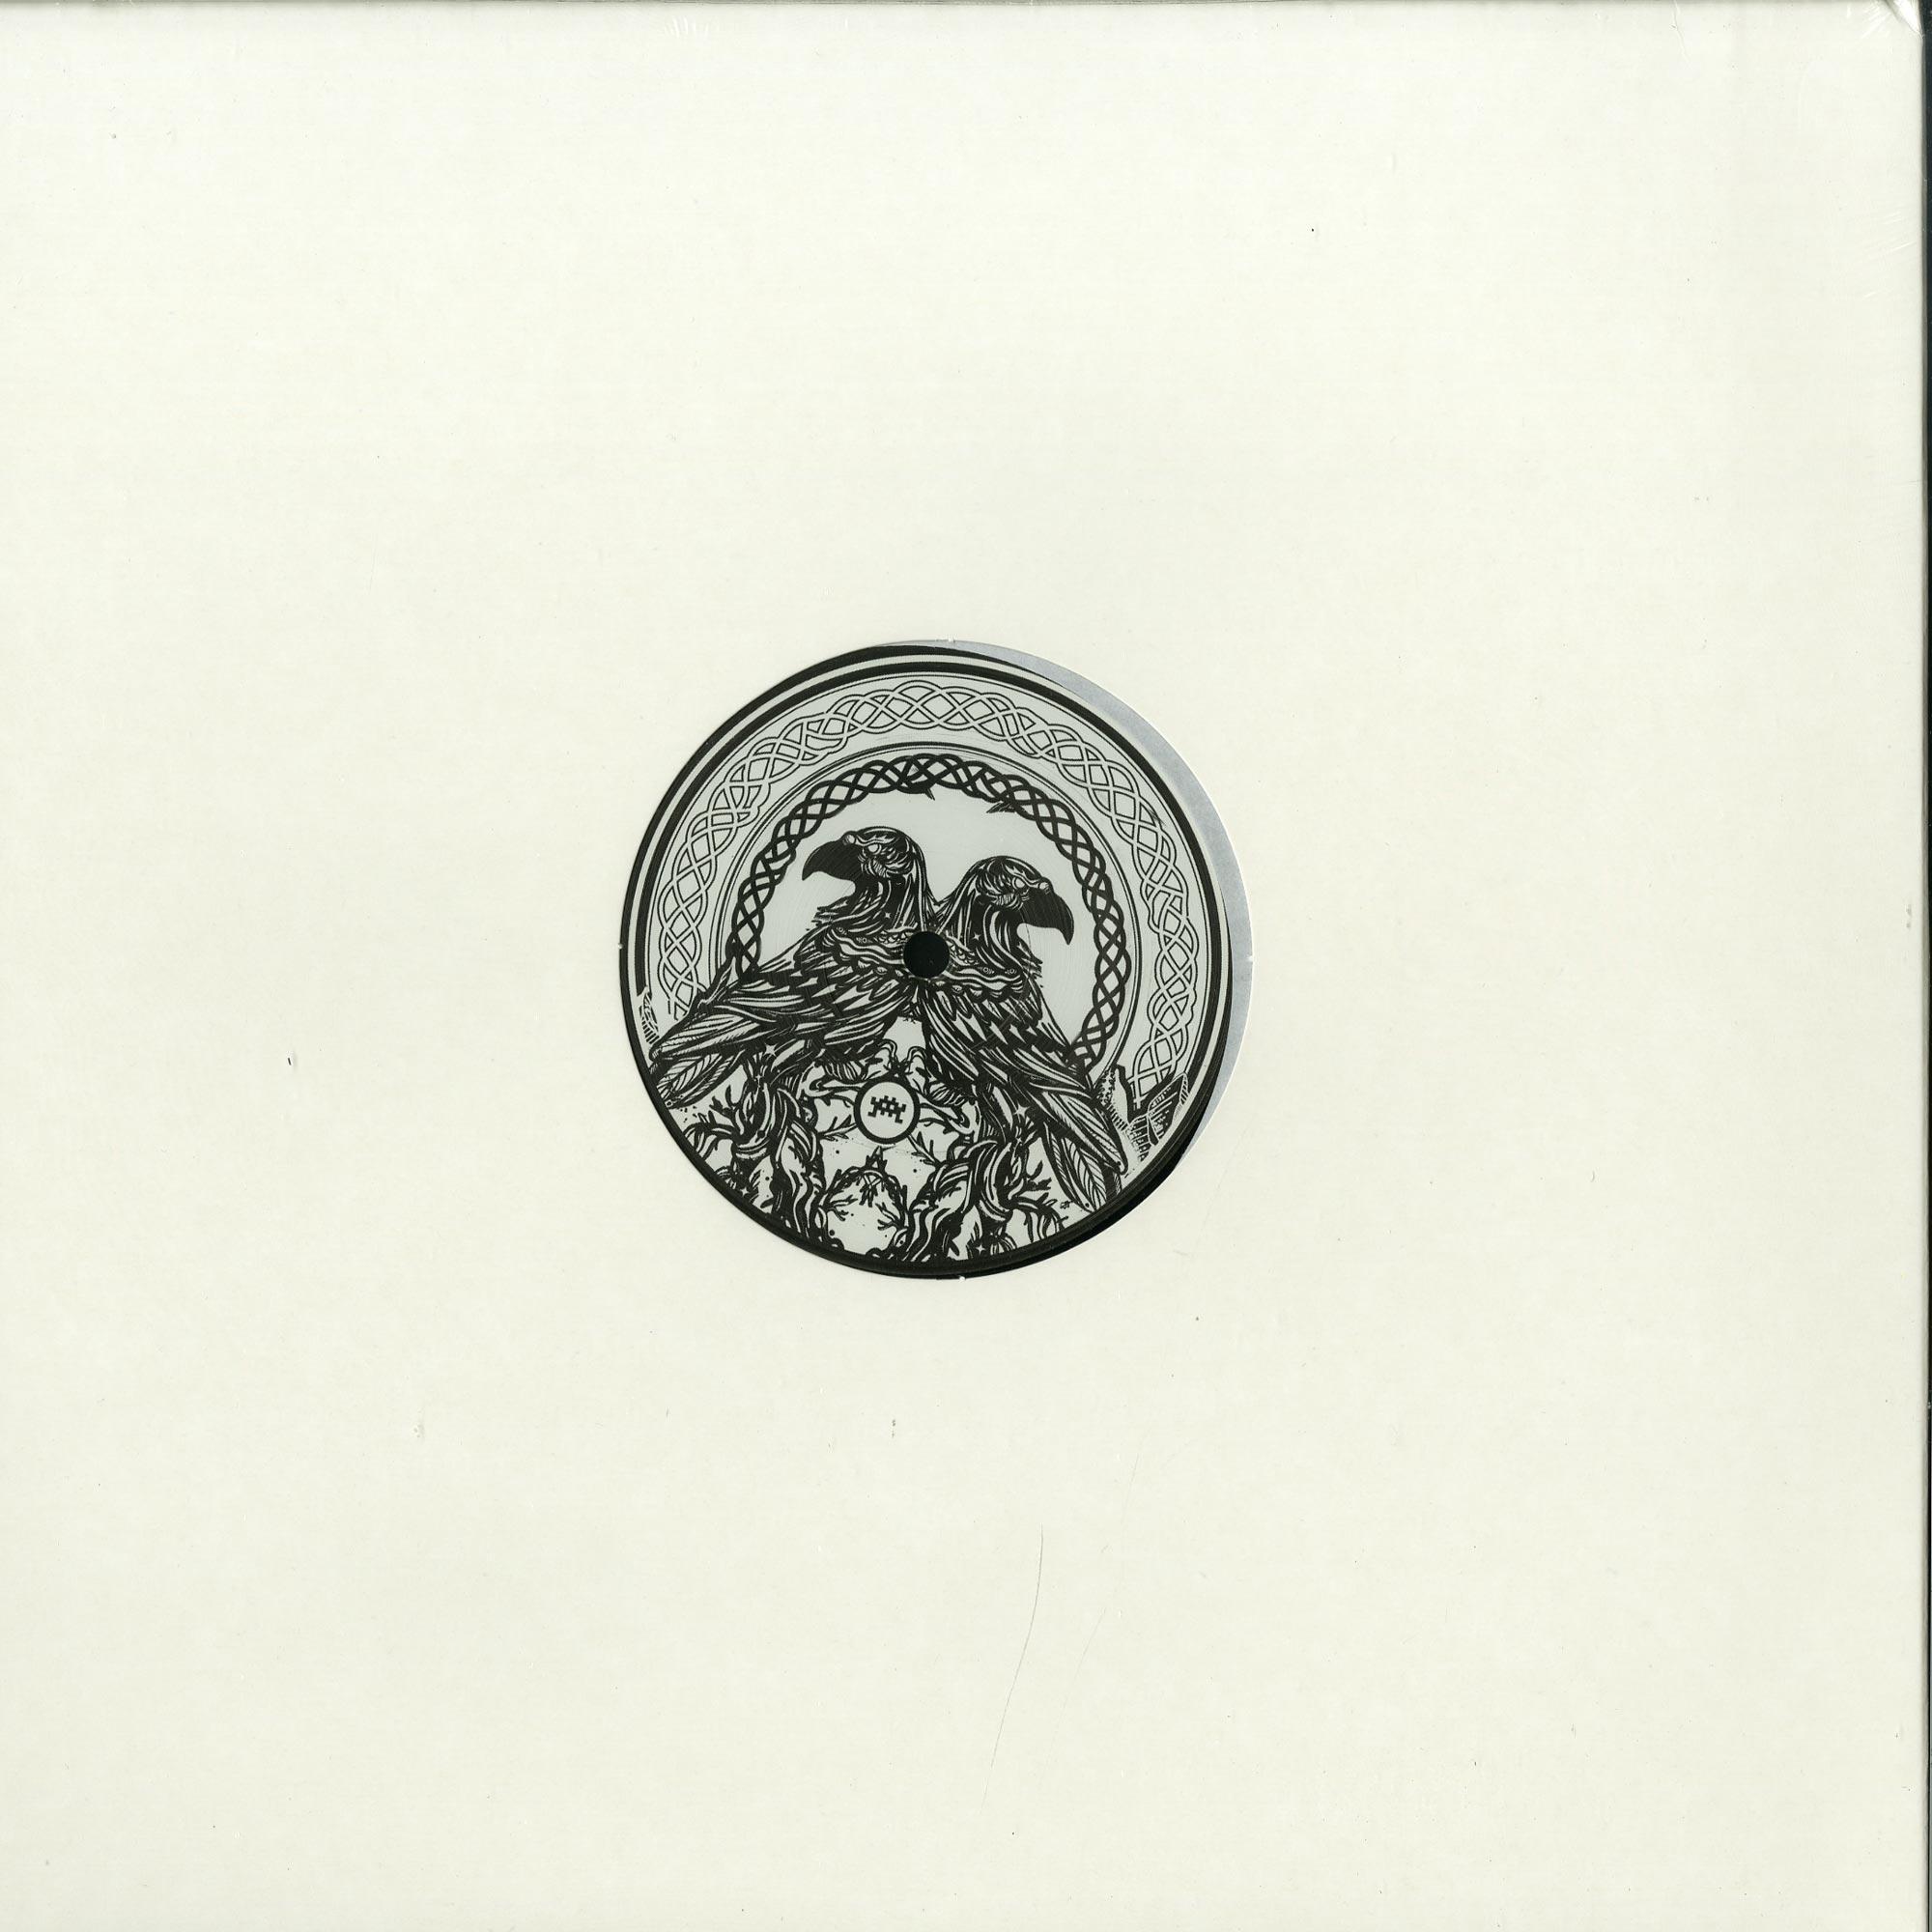 Chordata - MASG OF ORAHII EP